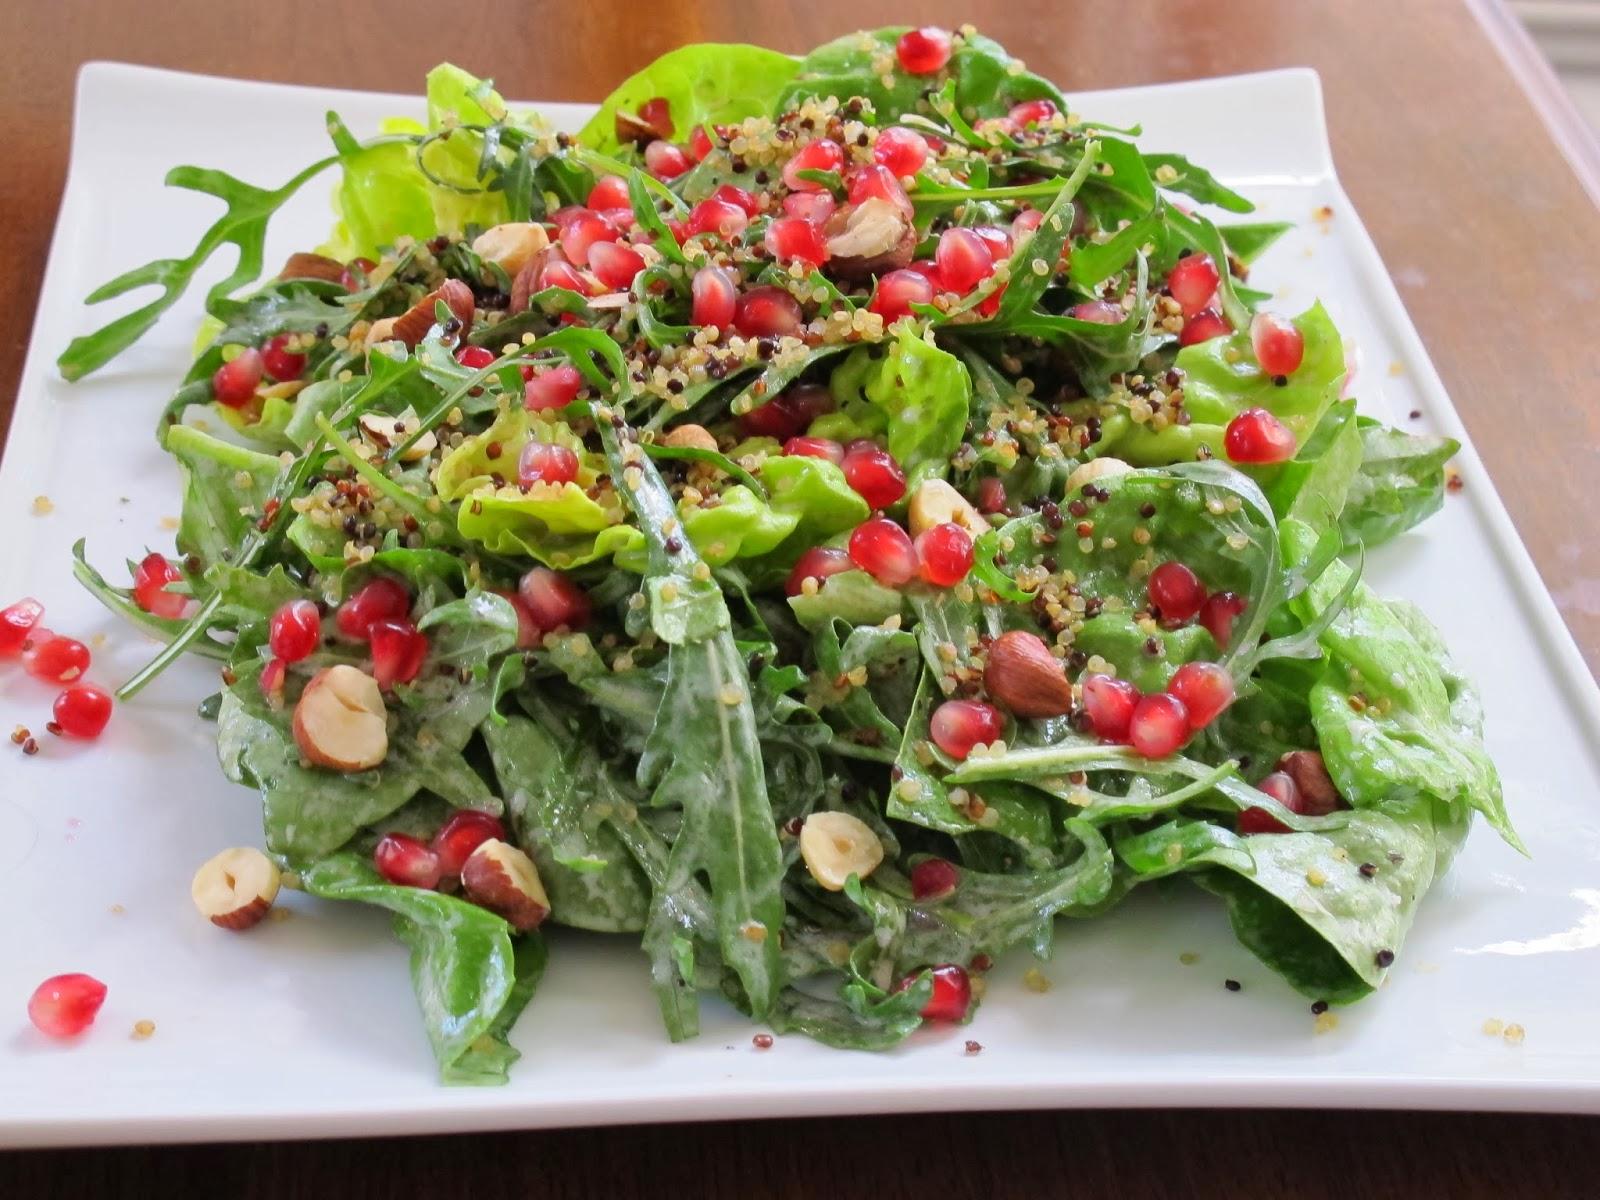 Green Salad with Crispy Quinoa and Pomegranate